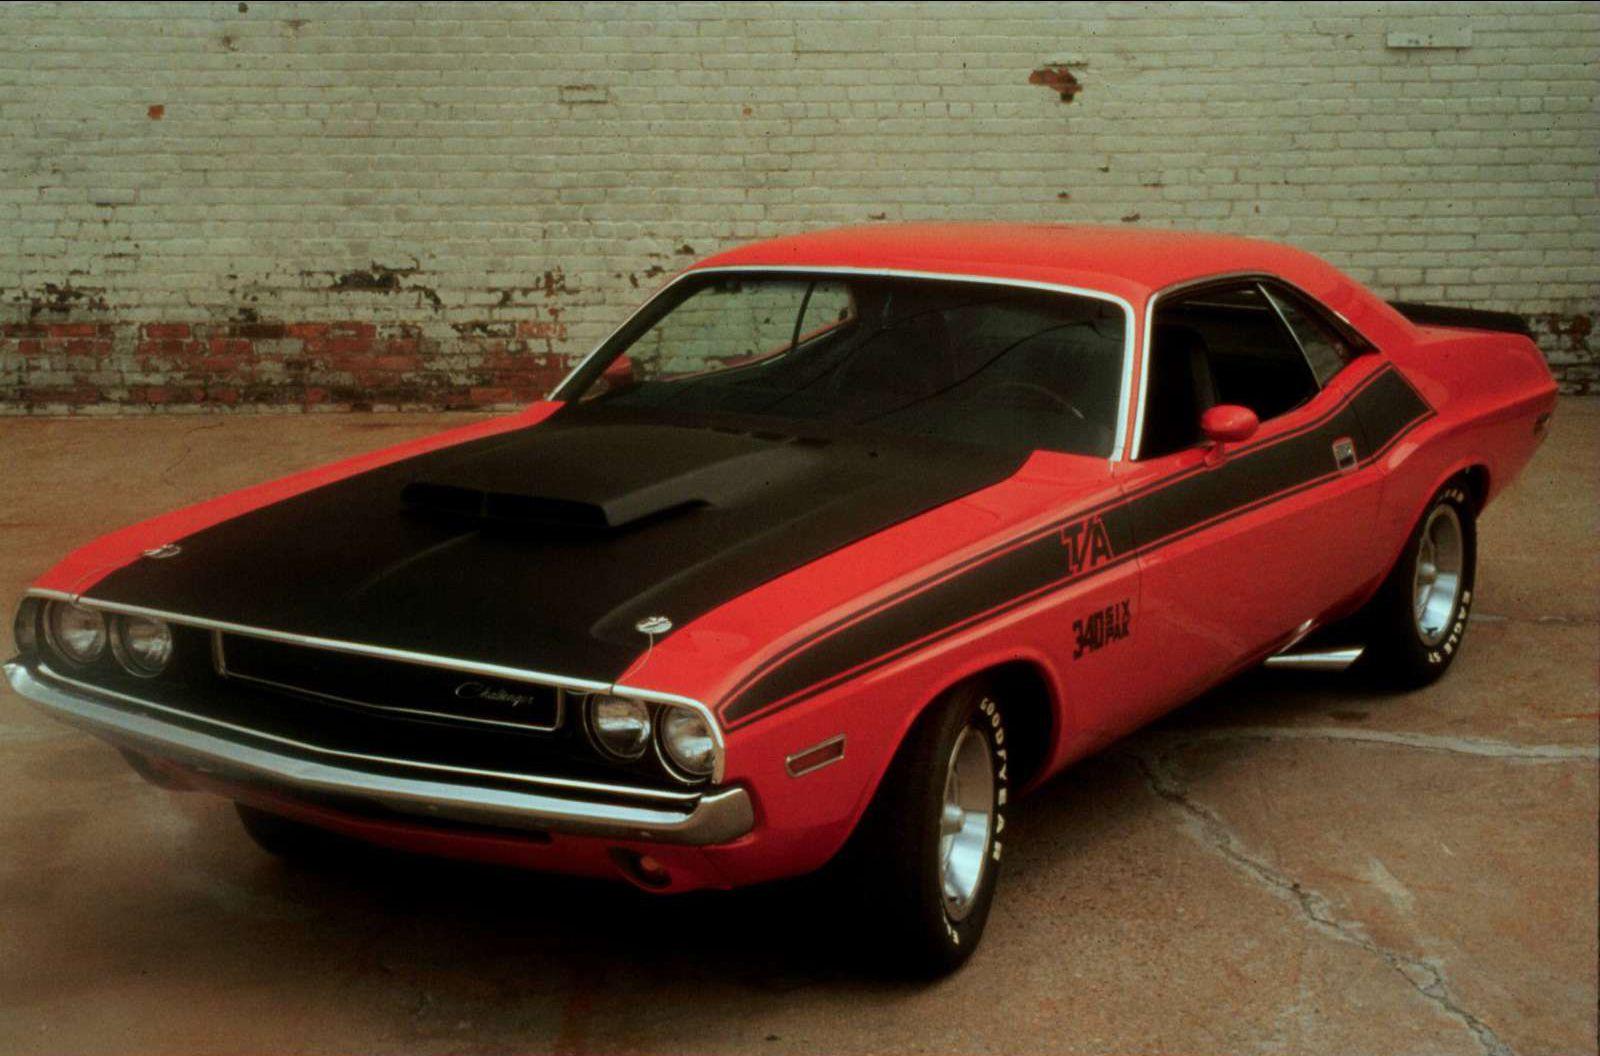 1970 Dodge Challanger T/A | Cars | Pinterest | Cars, Movie cars ...